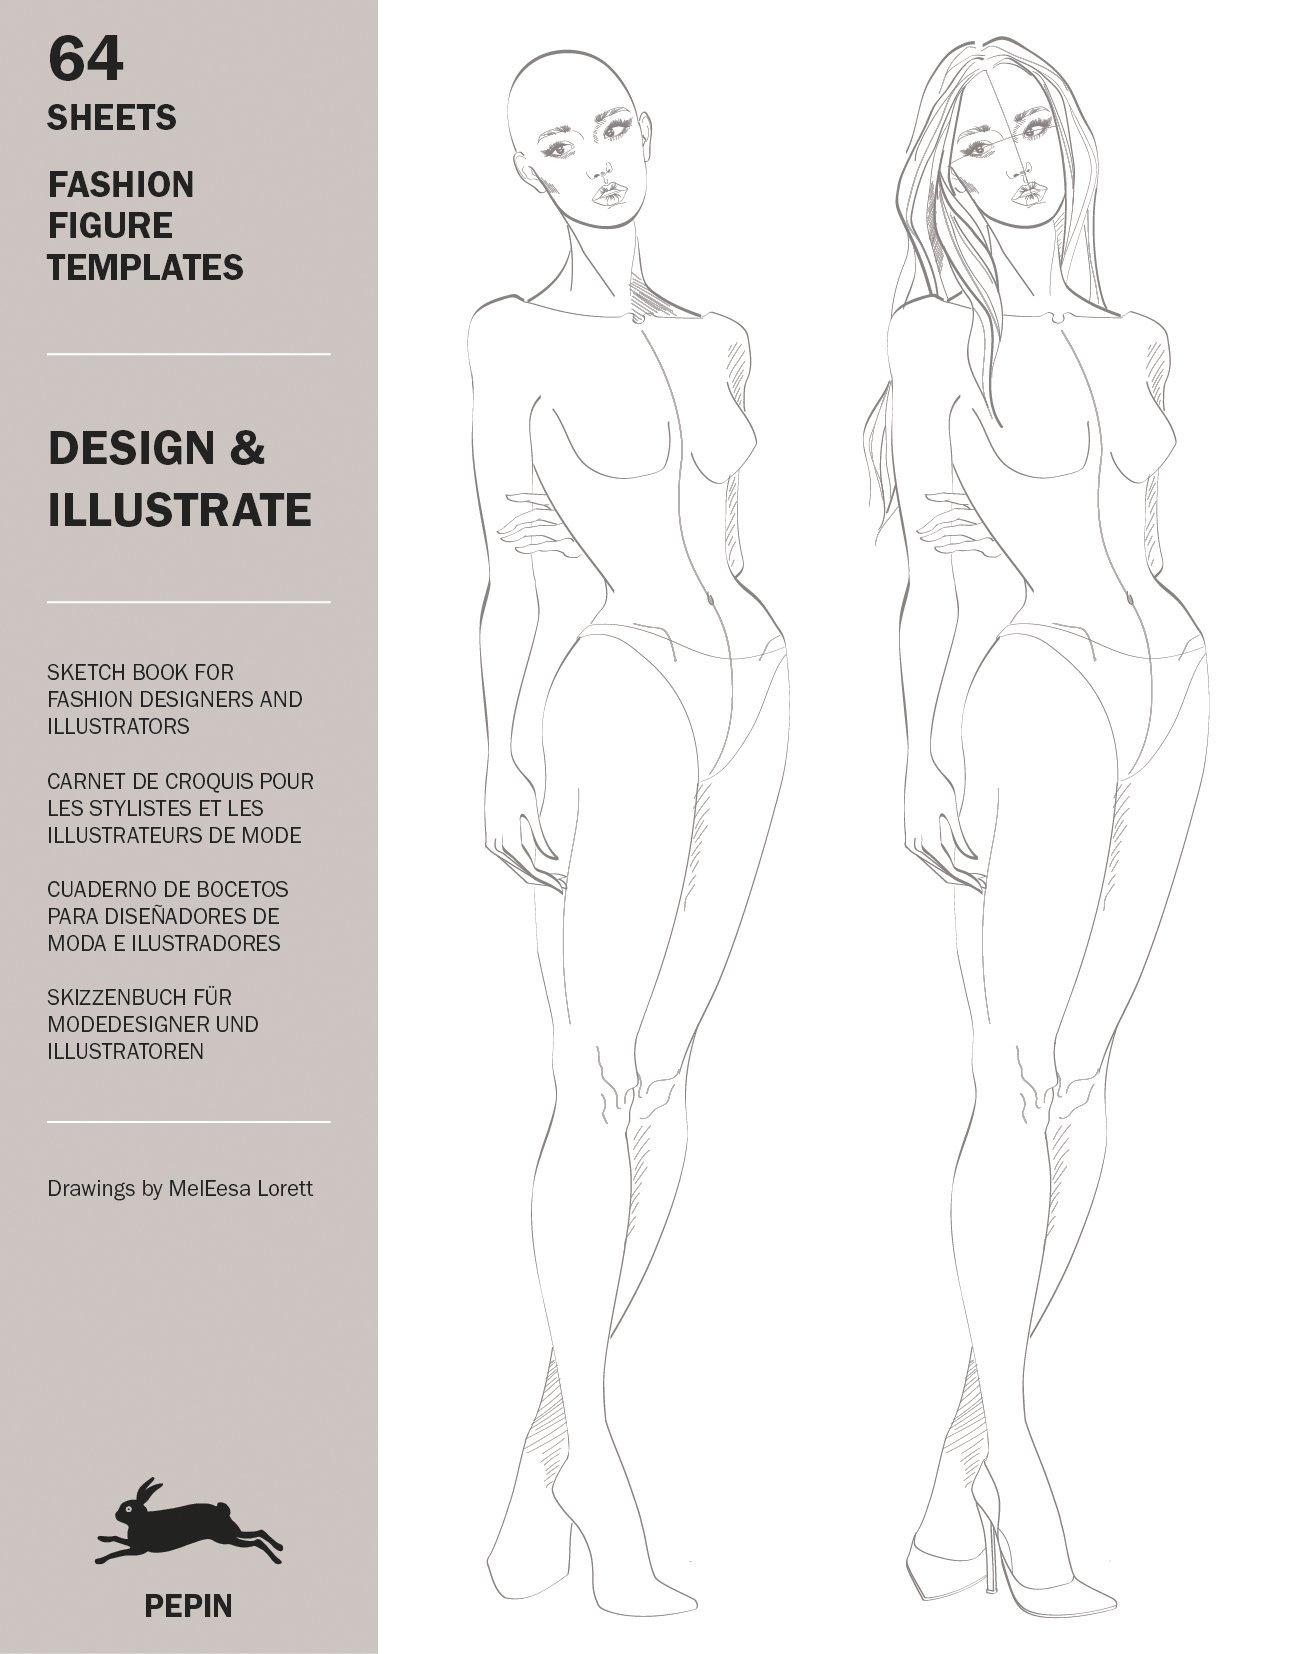 Design Ilustrate Fashion Figure Templates Multilingual Edition English Spanish French And German Edition Pepin Van Roojen Meleesa Lorett 9789460098383 Amazon Com Books